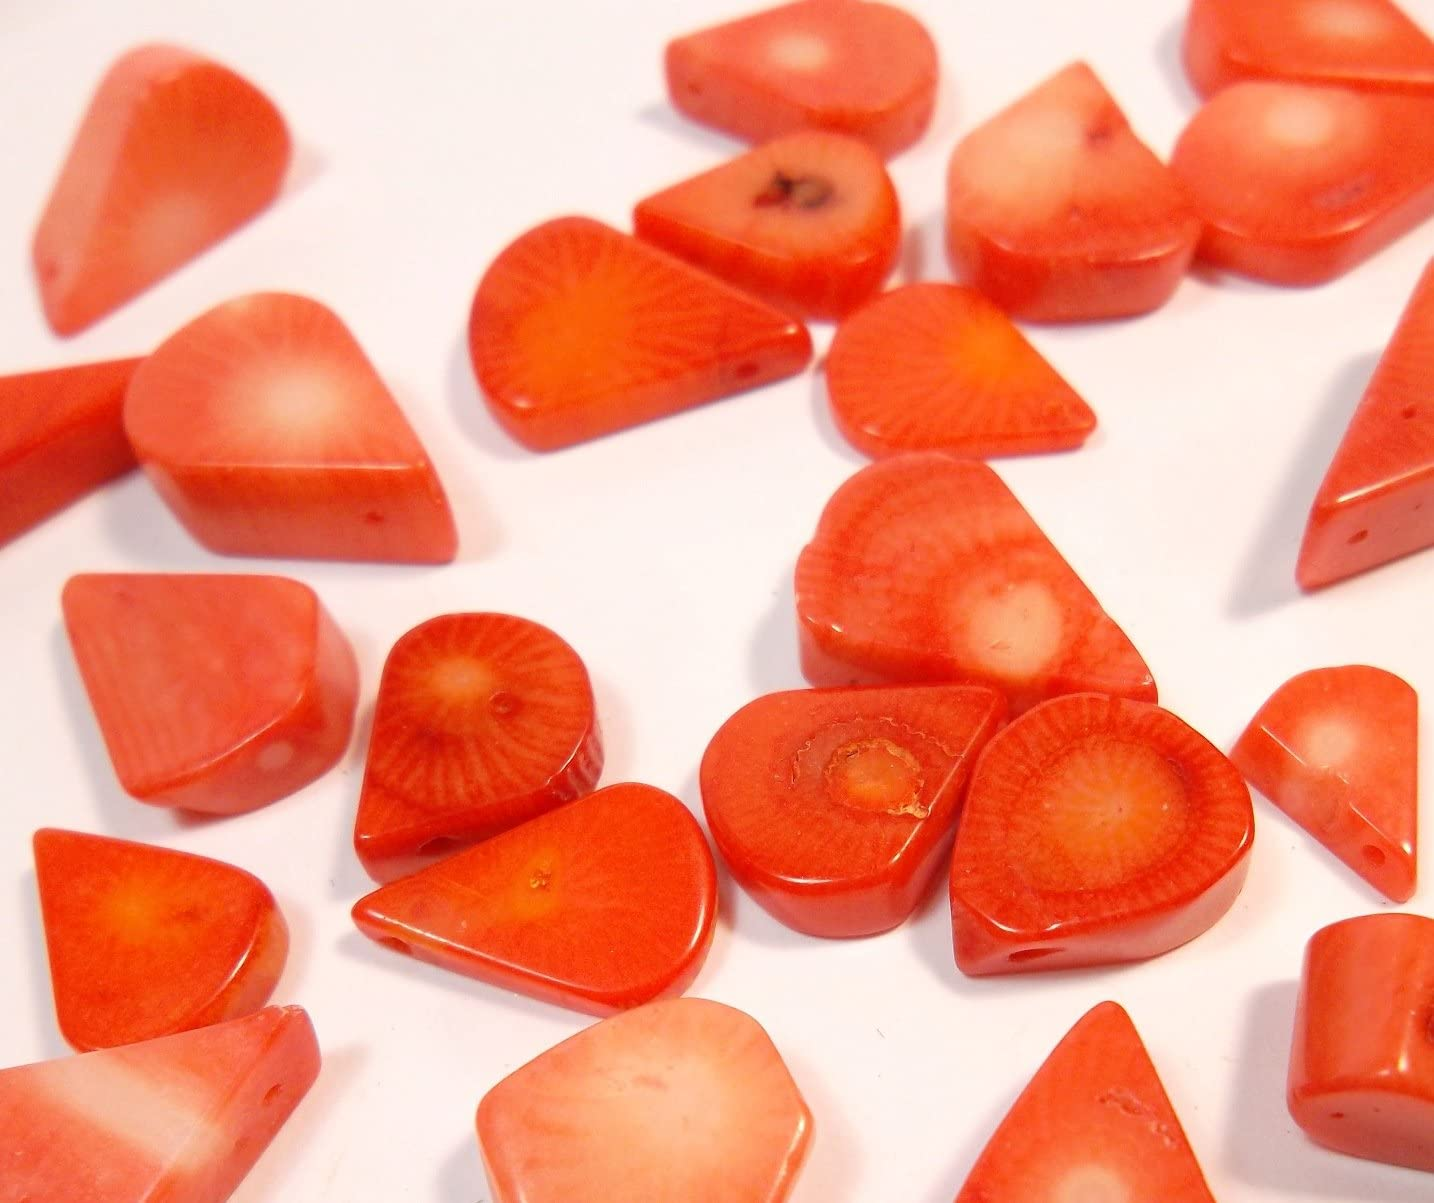 50g. Italiano Natural Perlas de Coral Rojo Koral Color Piedra Preciosa Piedra Natural Gota para Joyas Cadena Manualidades Coral Beads G641